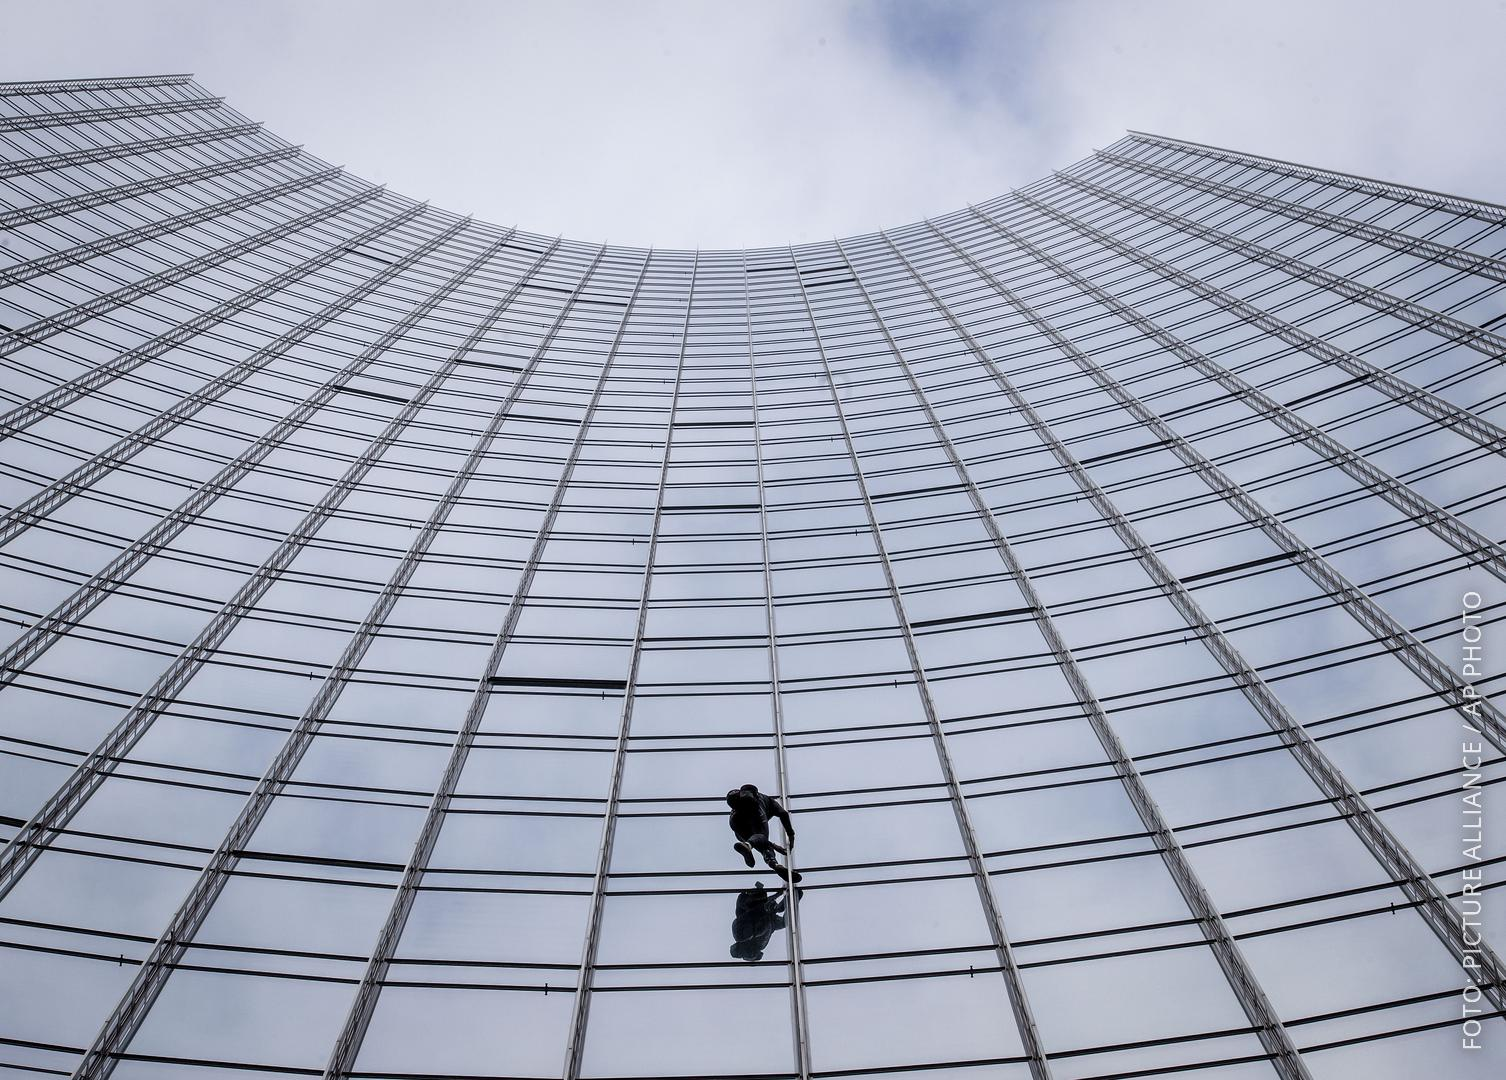 Der Kletterer Alain Robert hängt an der Fassade des Hochhauses in Frankfurt